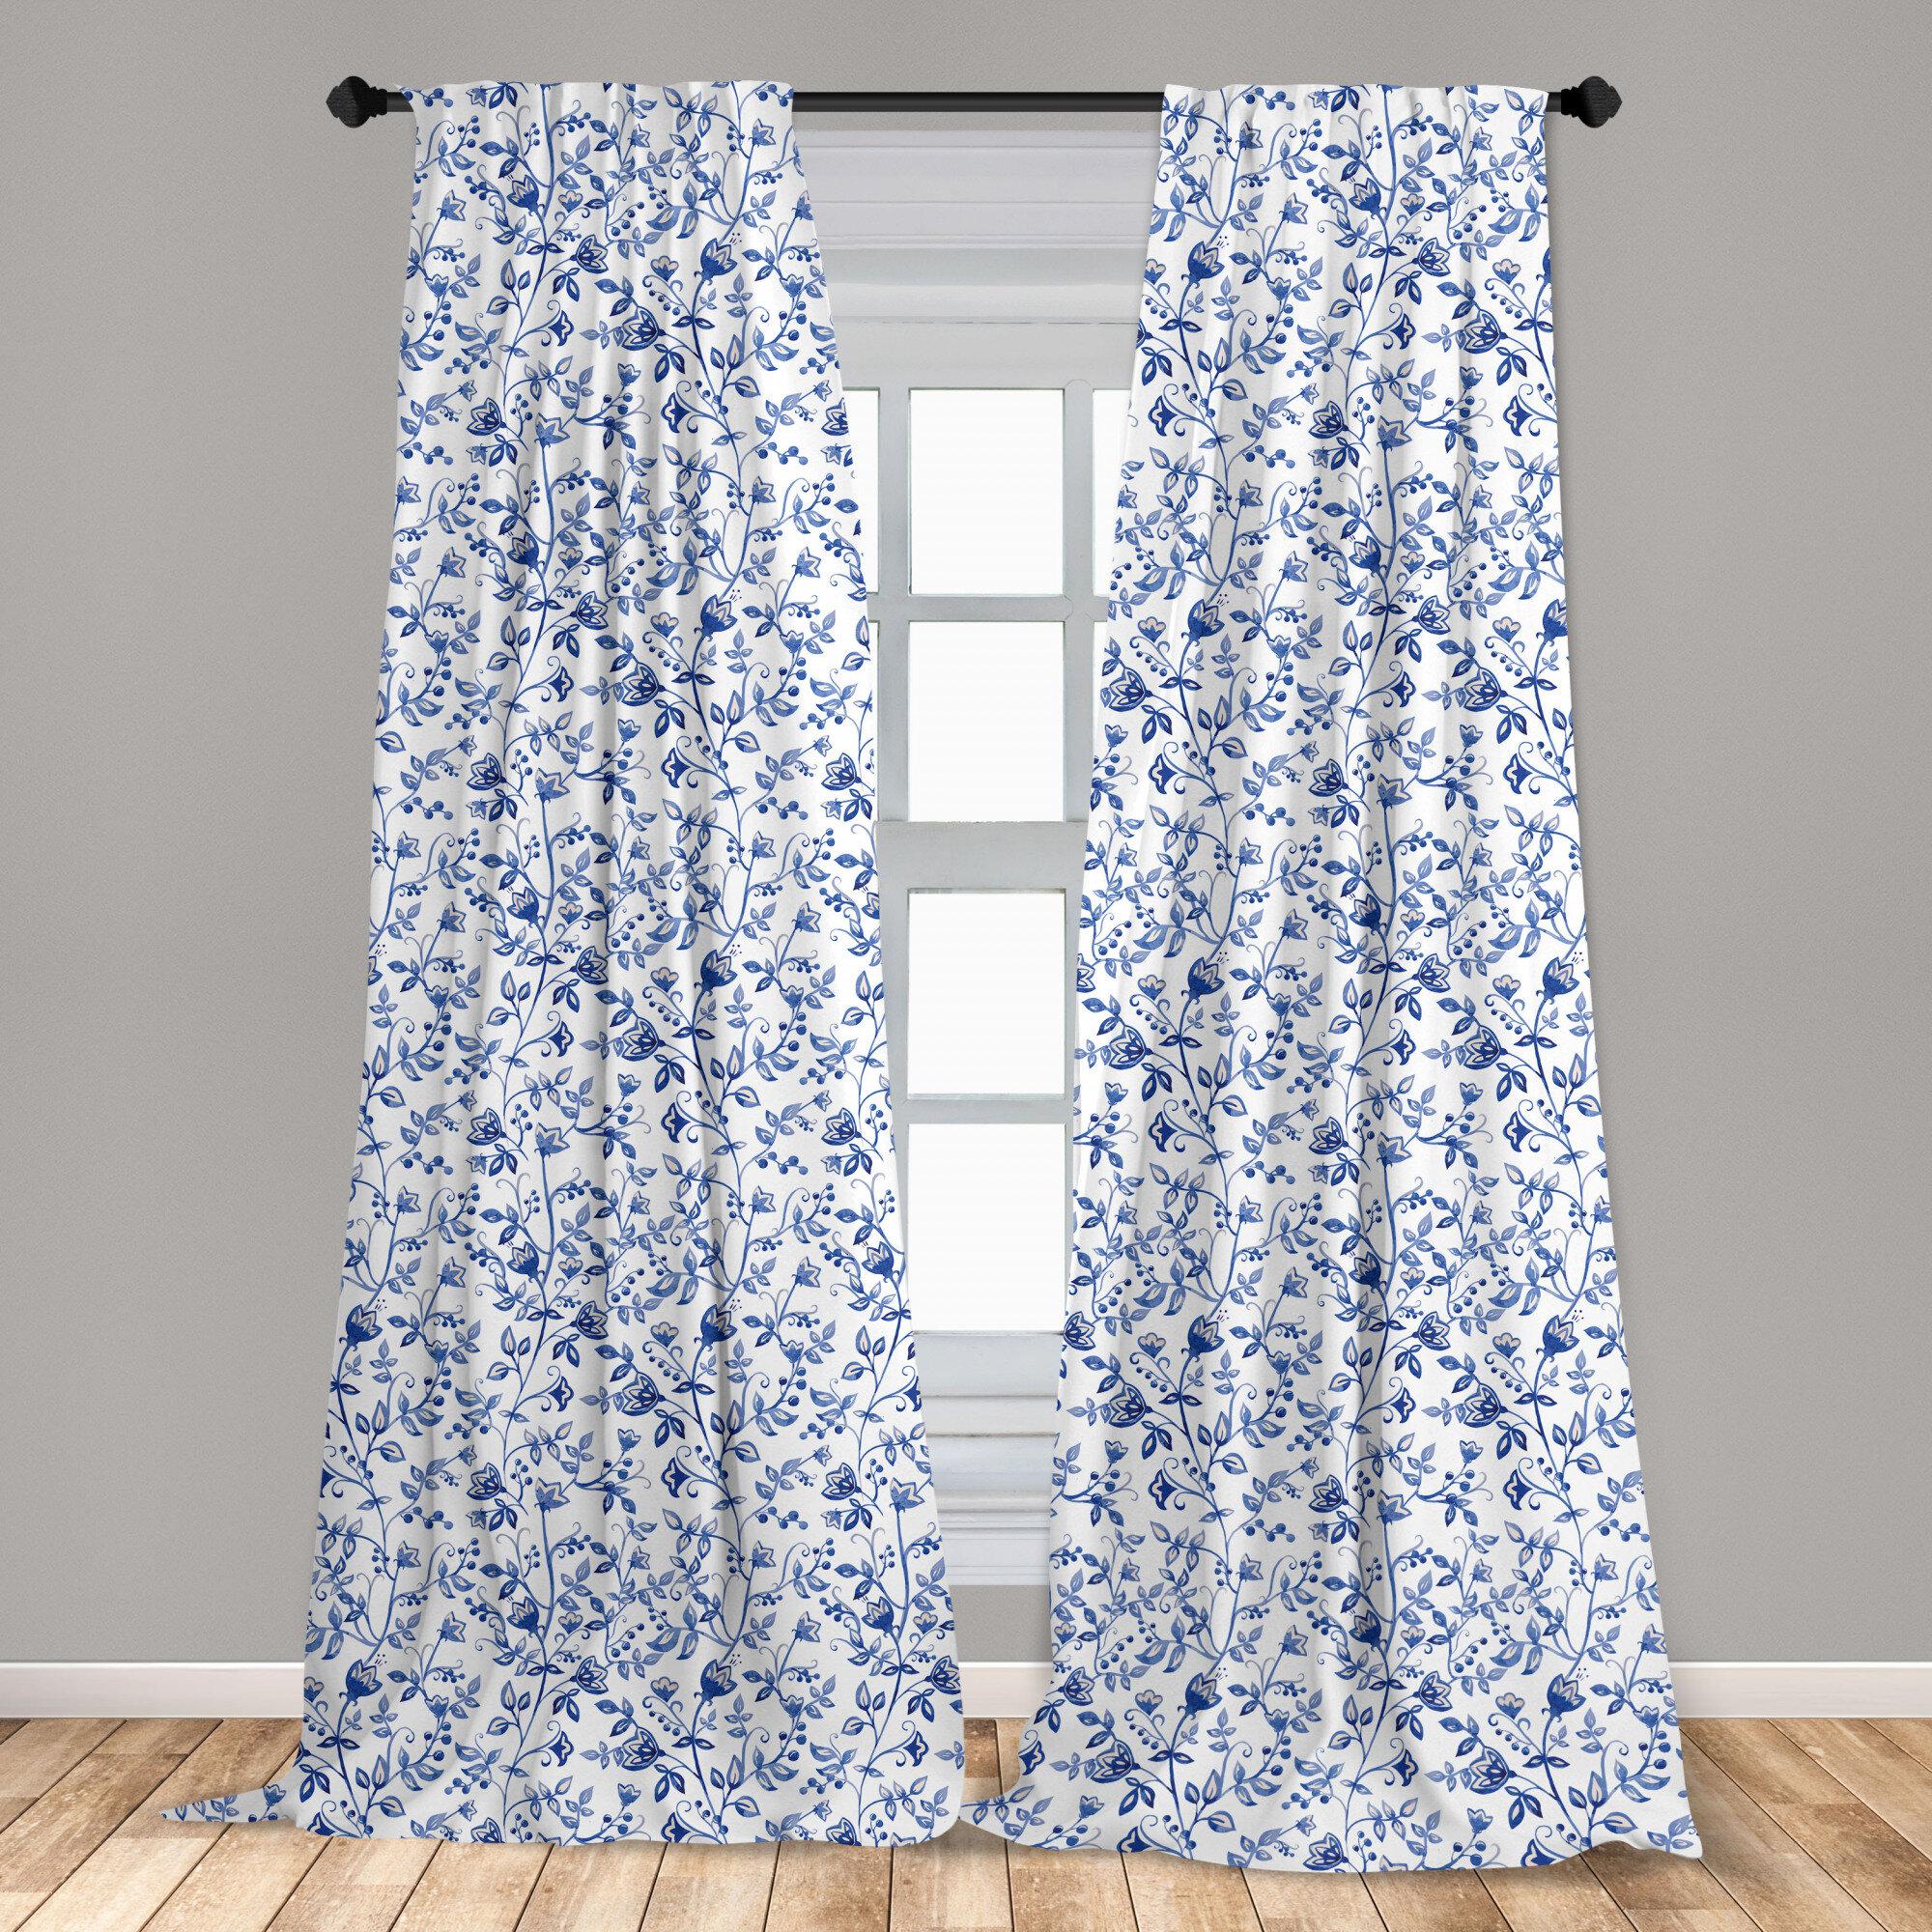 East Urban Home Felsenthal Watercolor Floral Room Darkening Rod Pocket Curtain Panels Reviews Wayfair